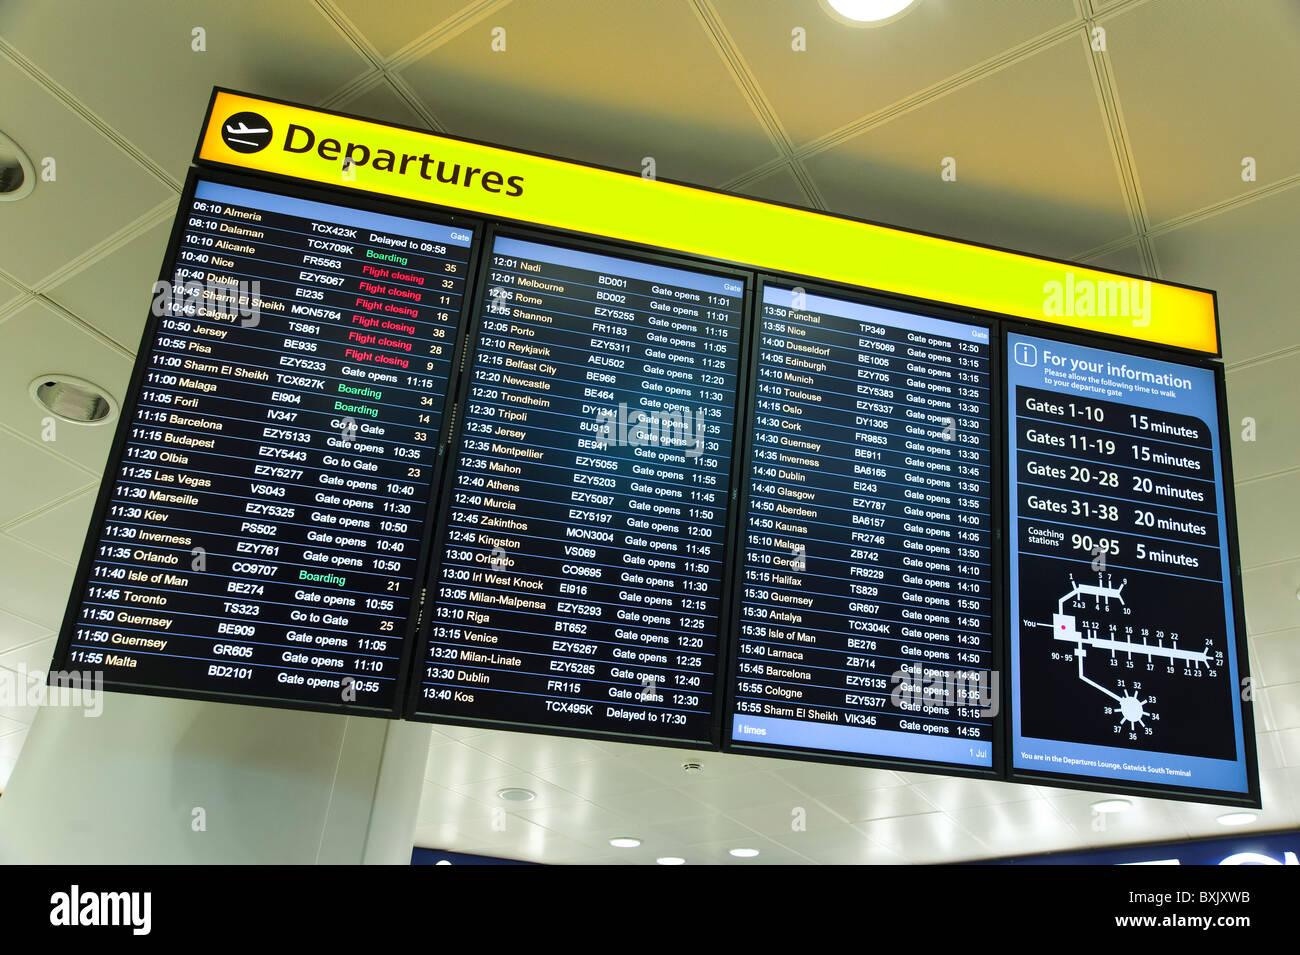 Airport departures board, England, UK - Stock Image